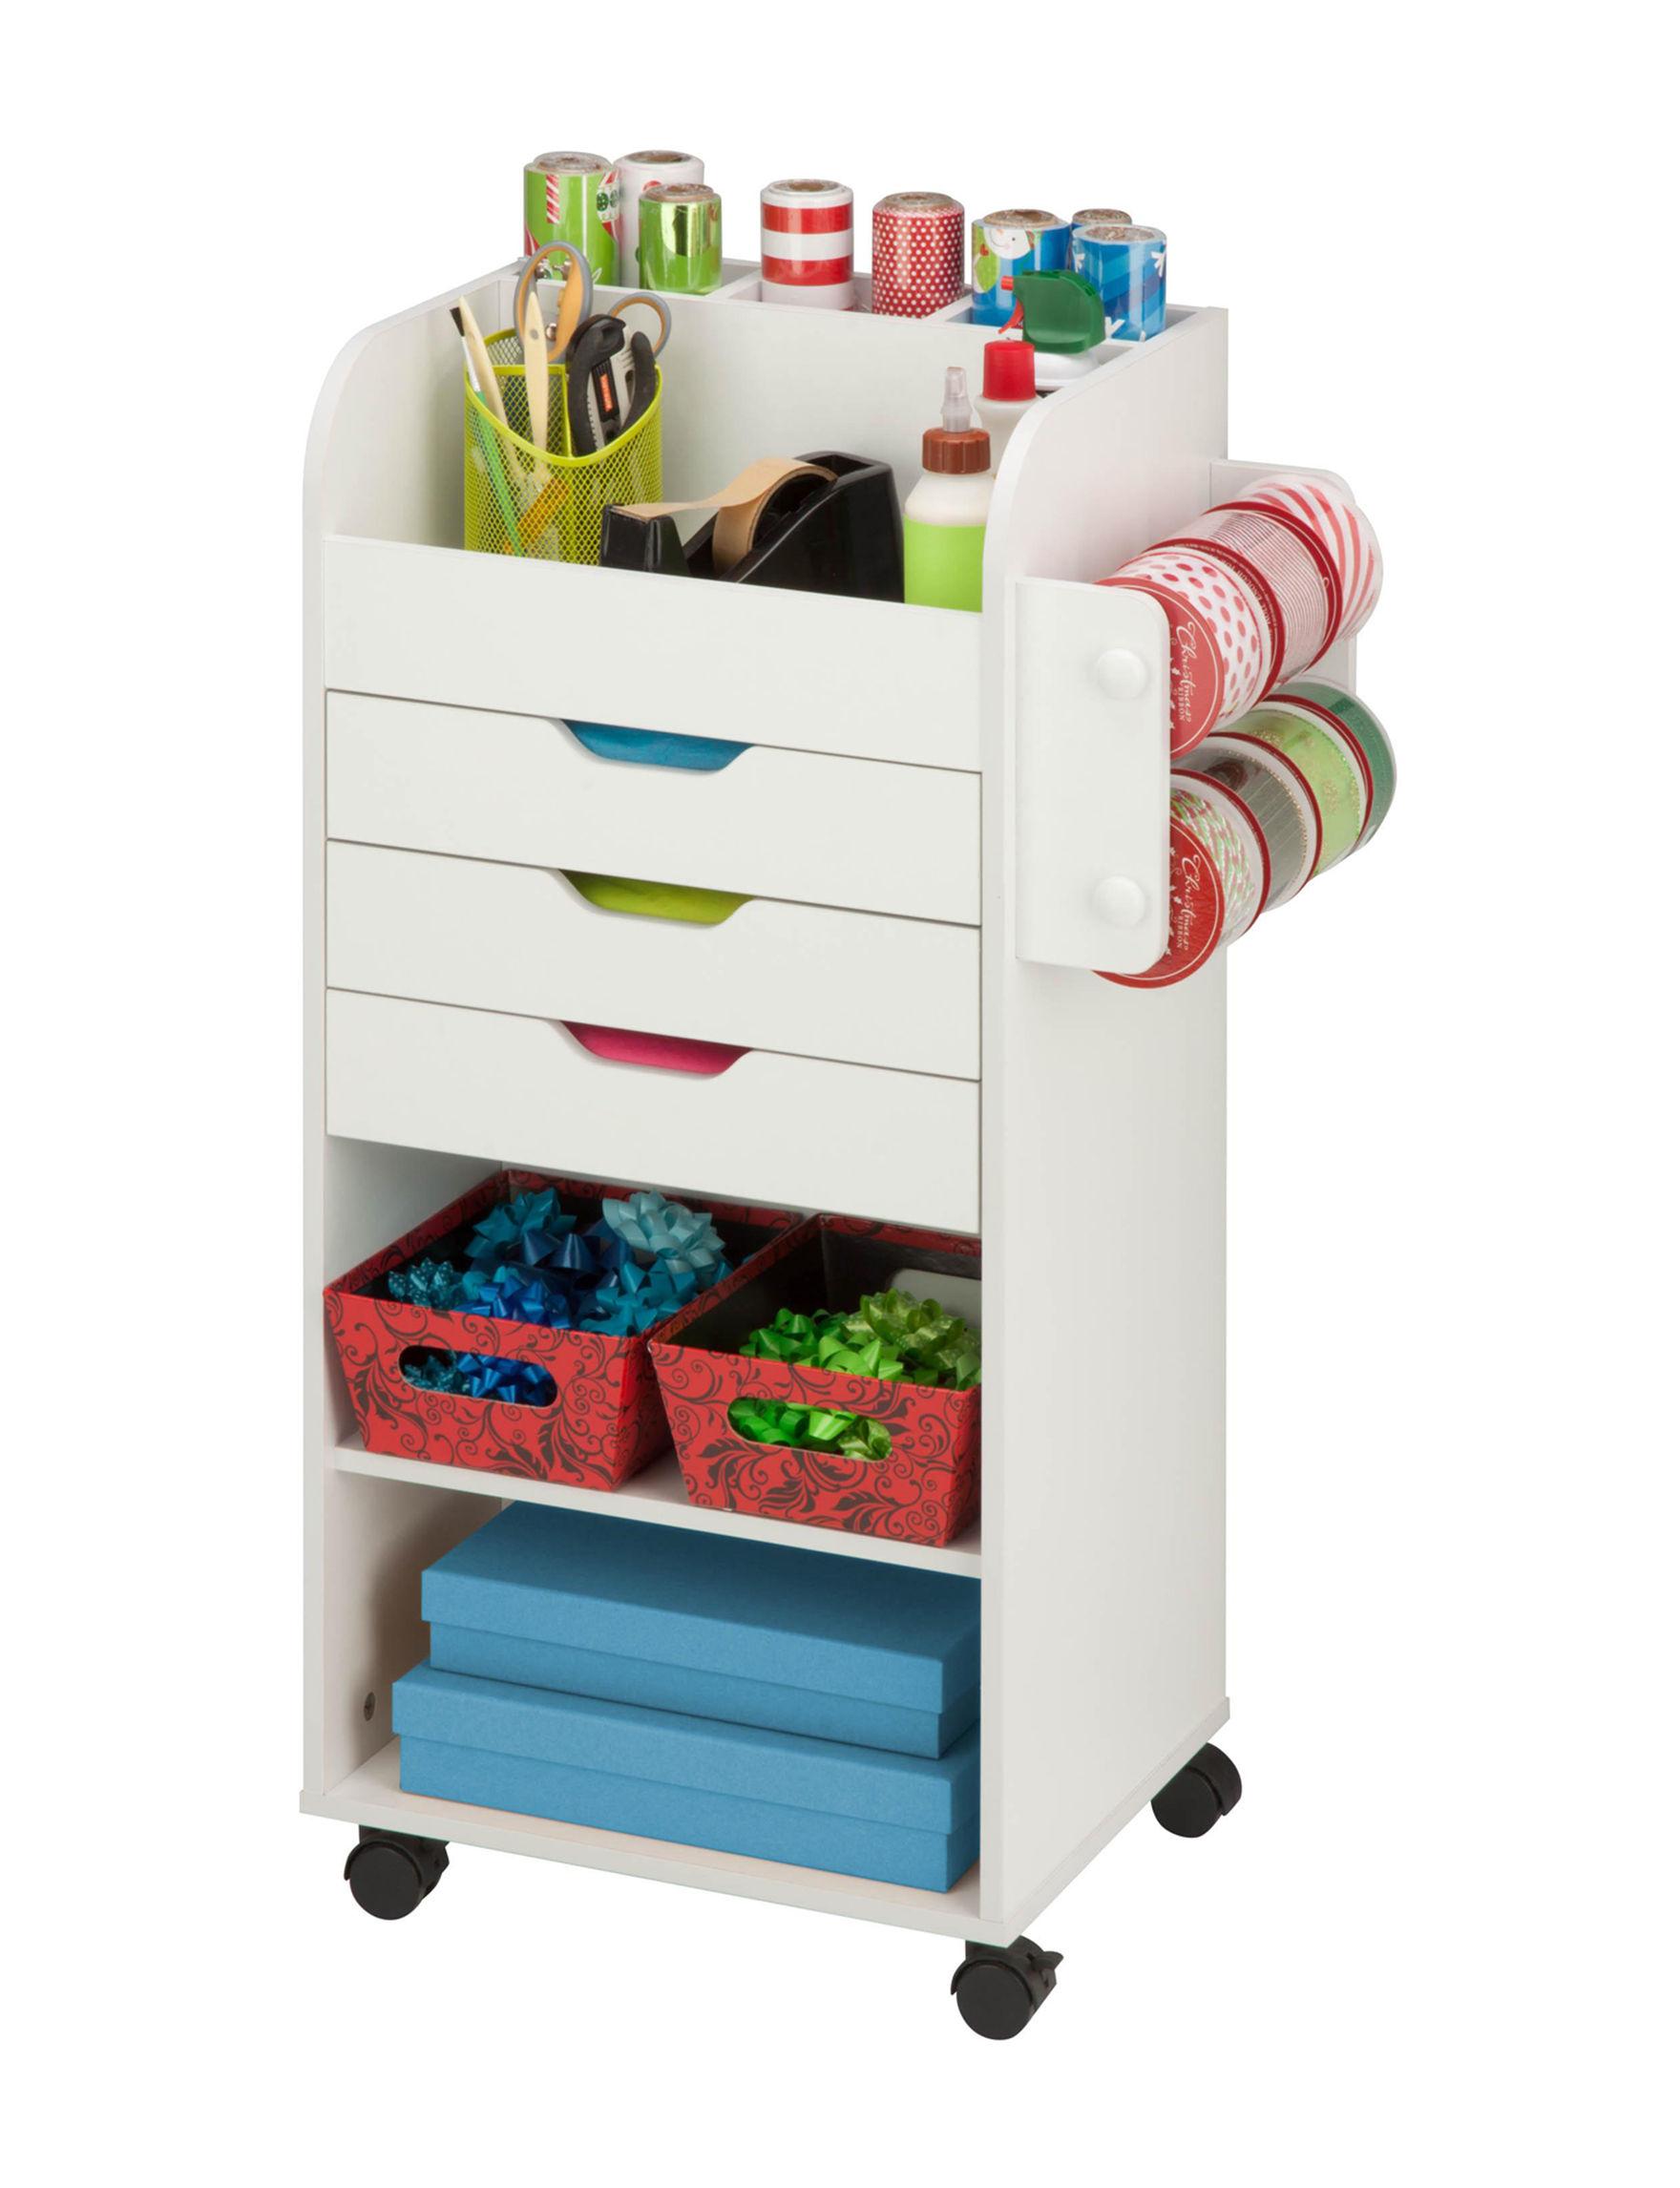 Honey-Can-Do International White Carts & Drawers Storage & Organization